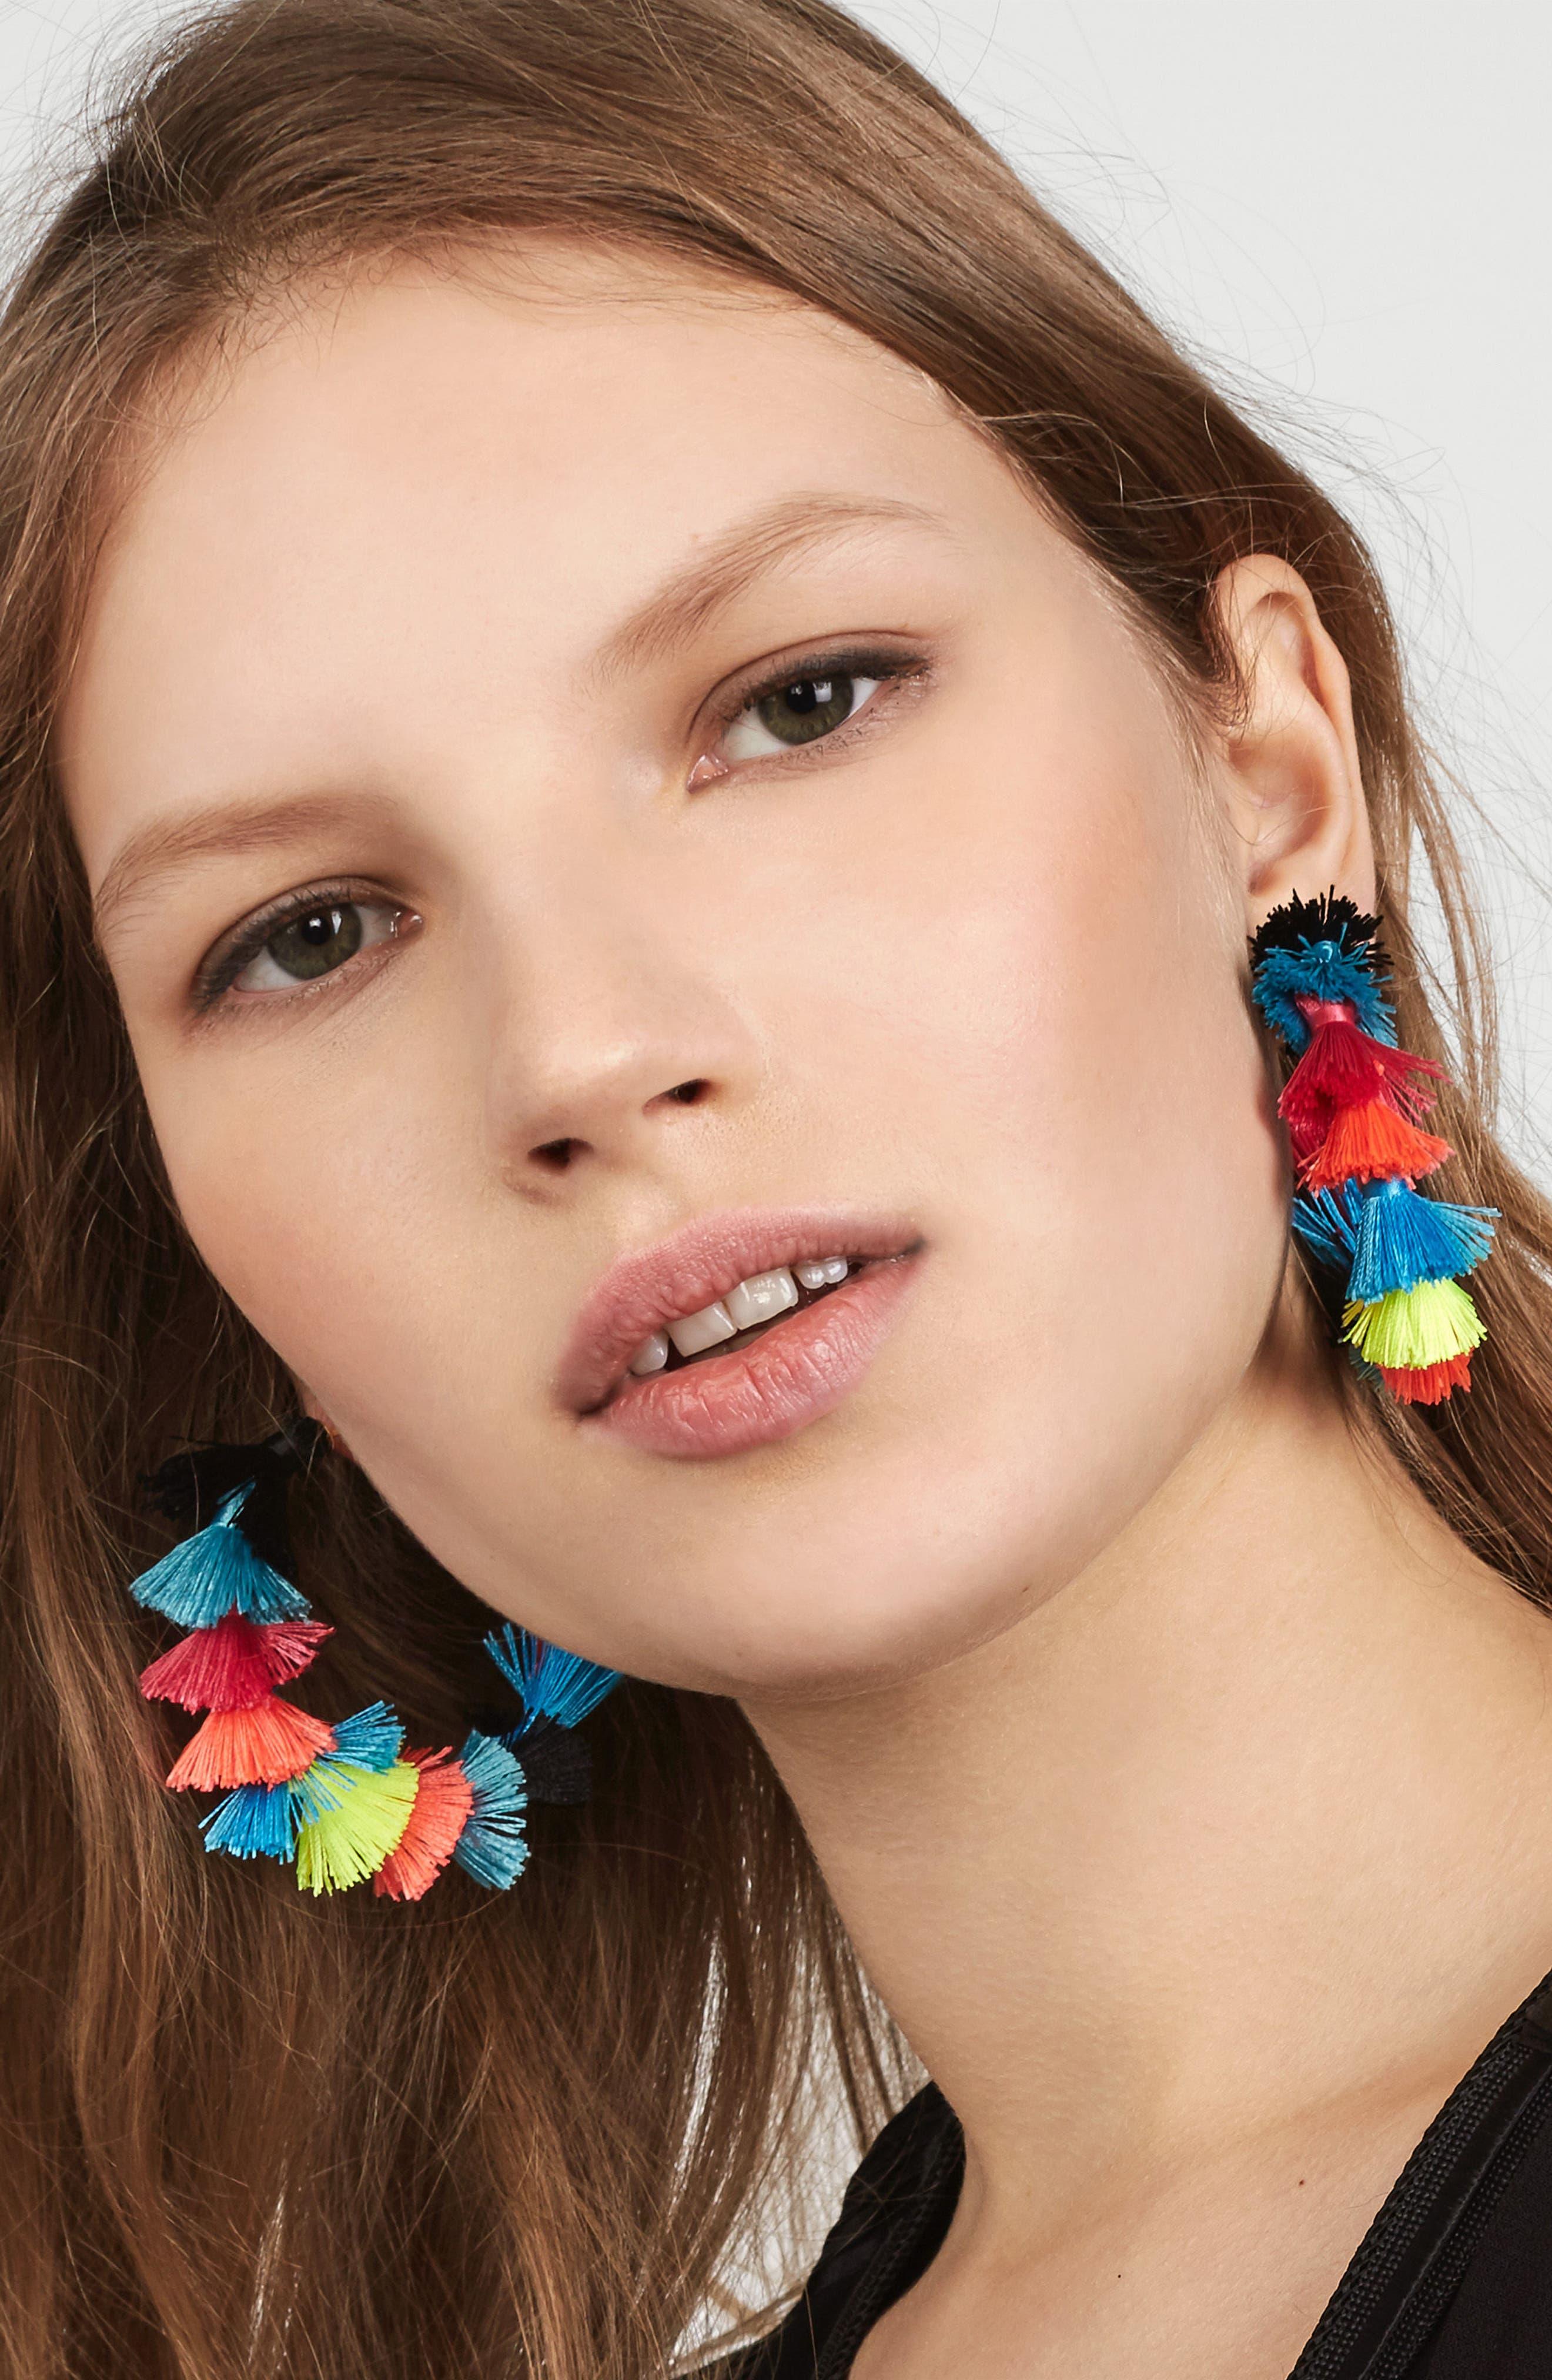 Santina Tasseled Hoop Earrings,                             Alternate thumbnail 2, color,